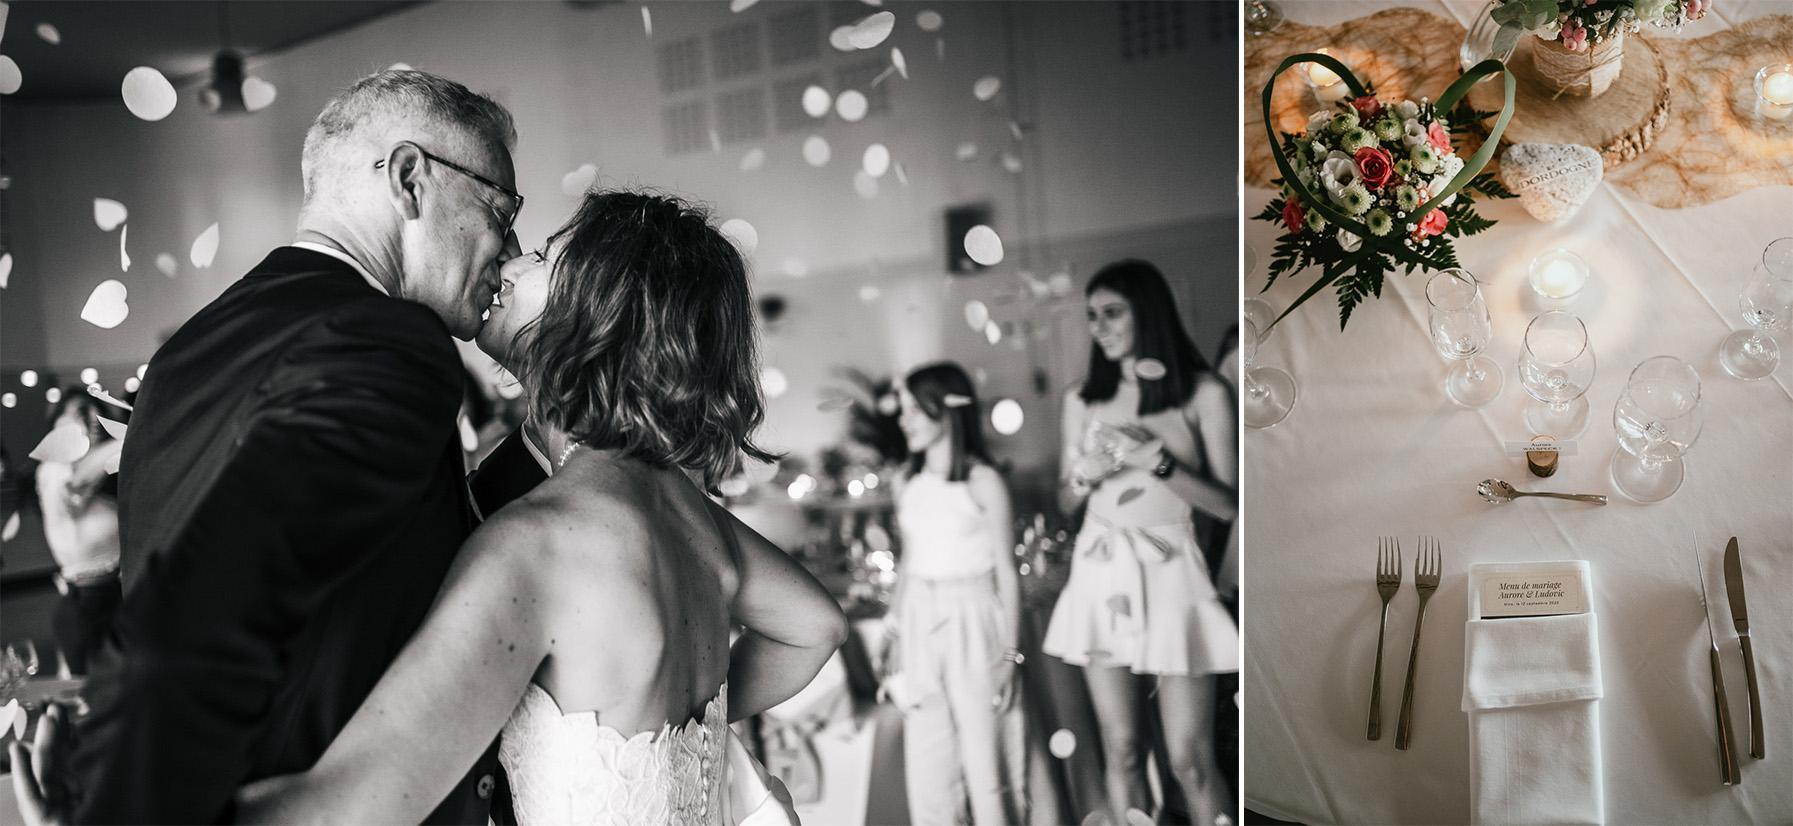 Photographe mariage landes dax aquitaine 11